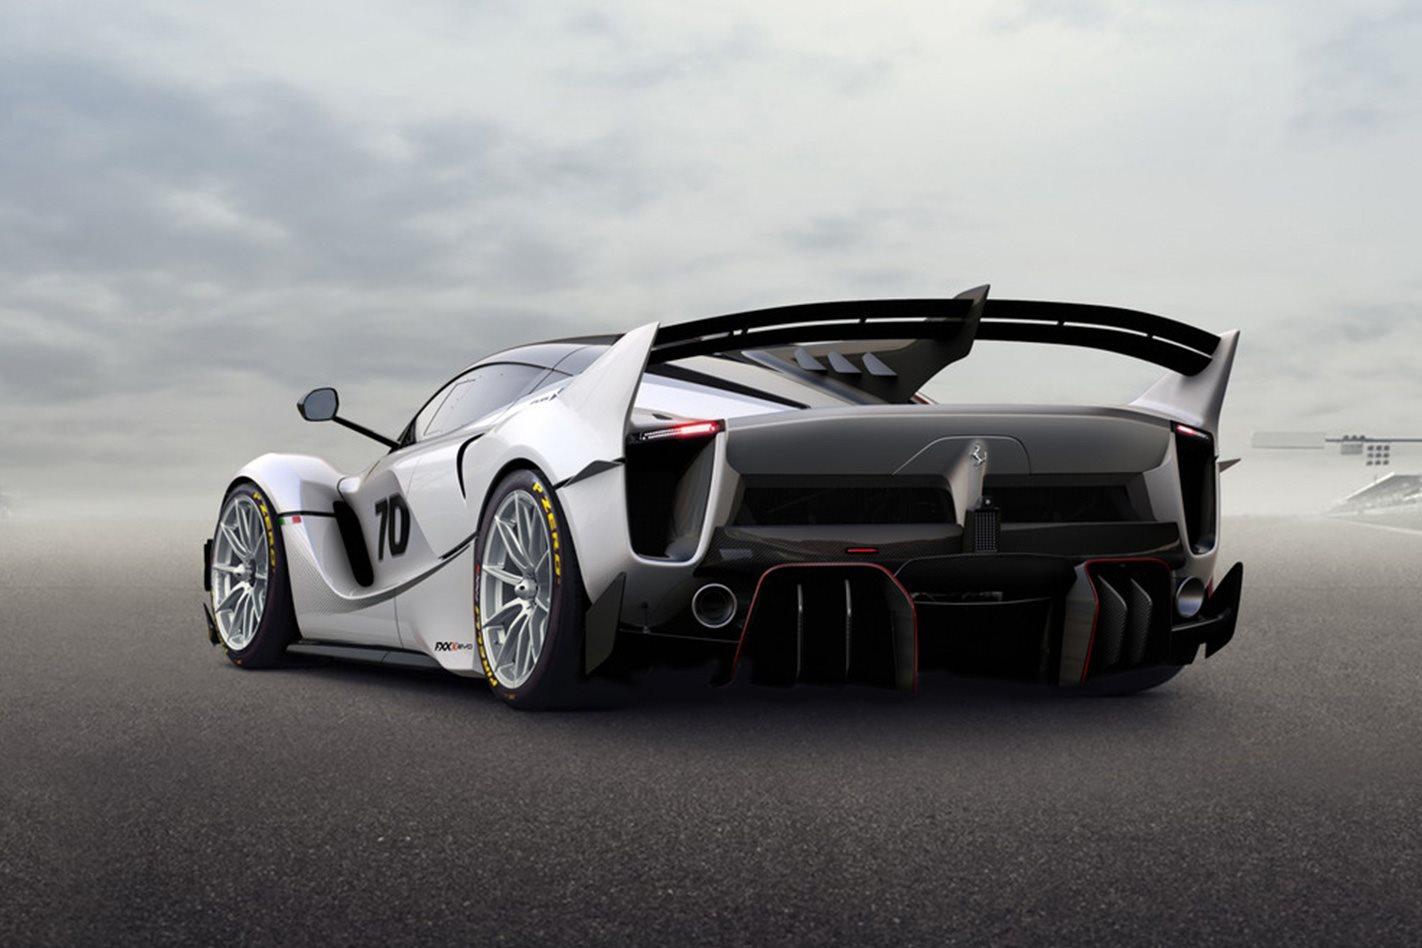 Ferrari-FXX-K-Evoluzione-exhaust.jpg